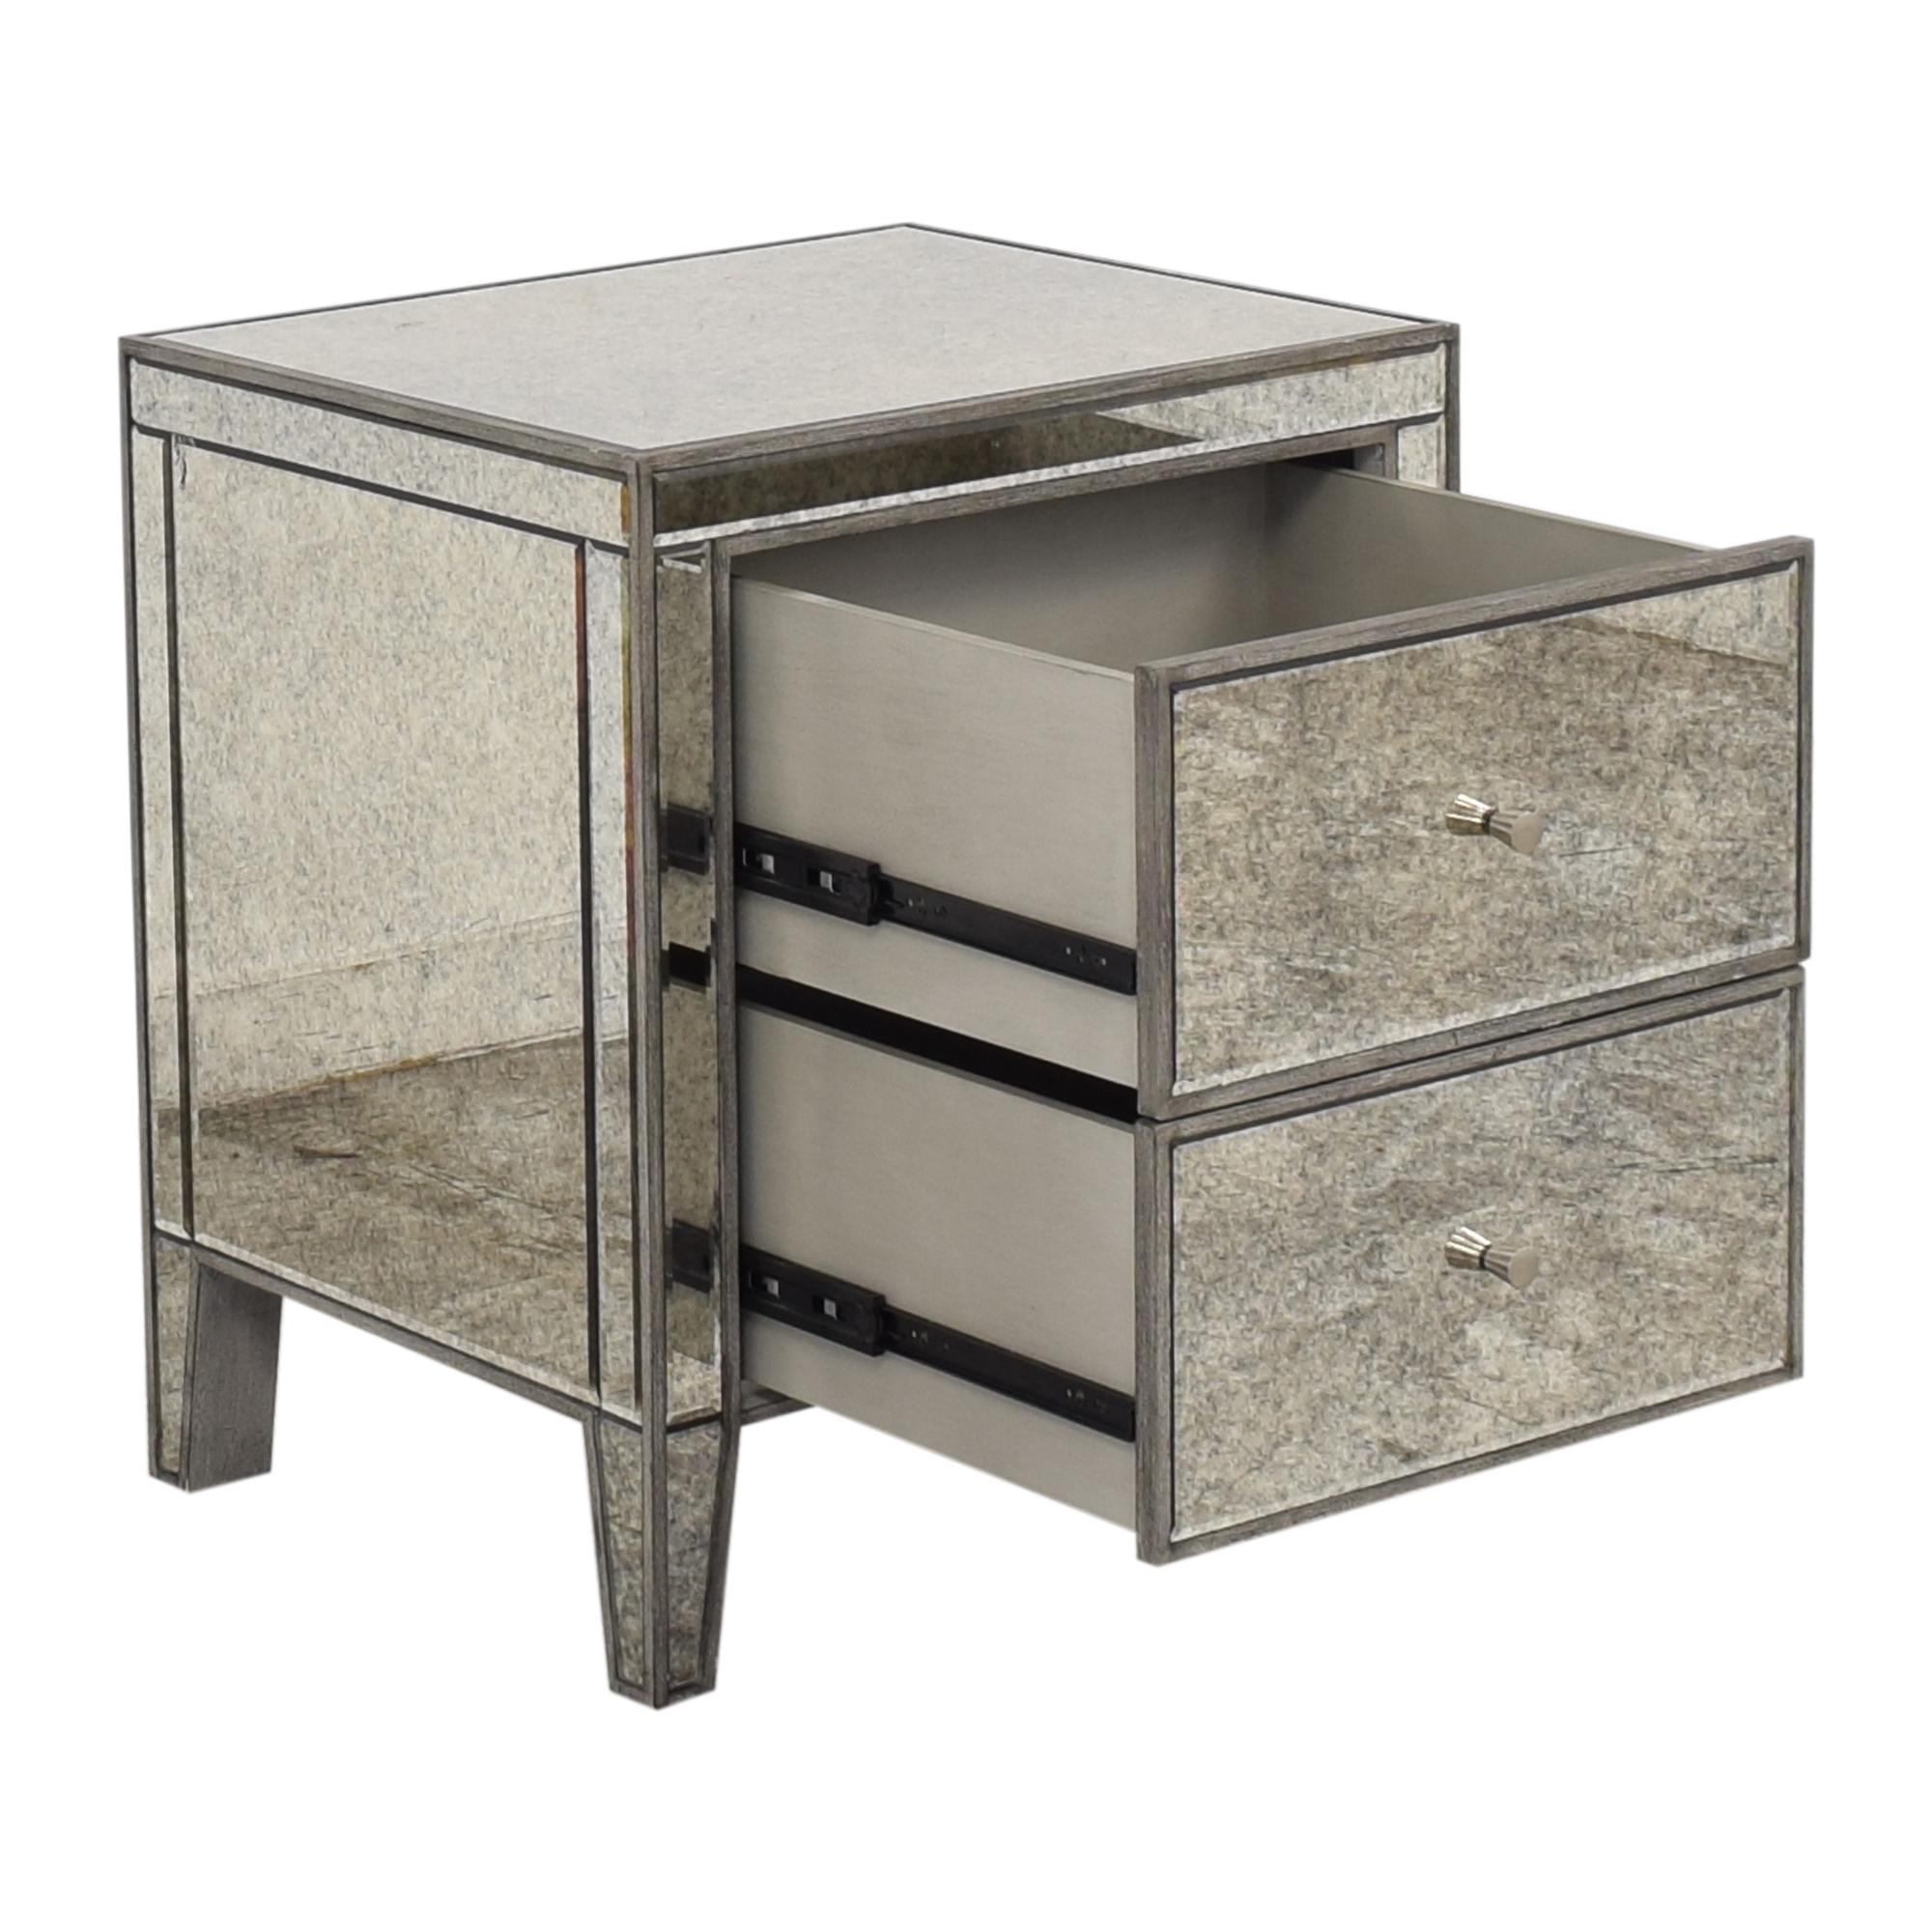 Arhaus Reese Two Drawer Nightstand / Tables